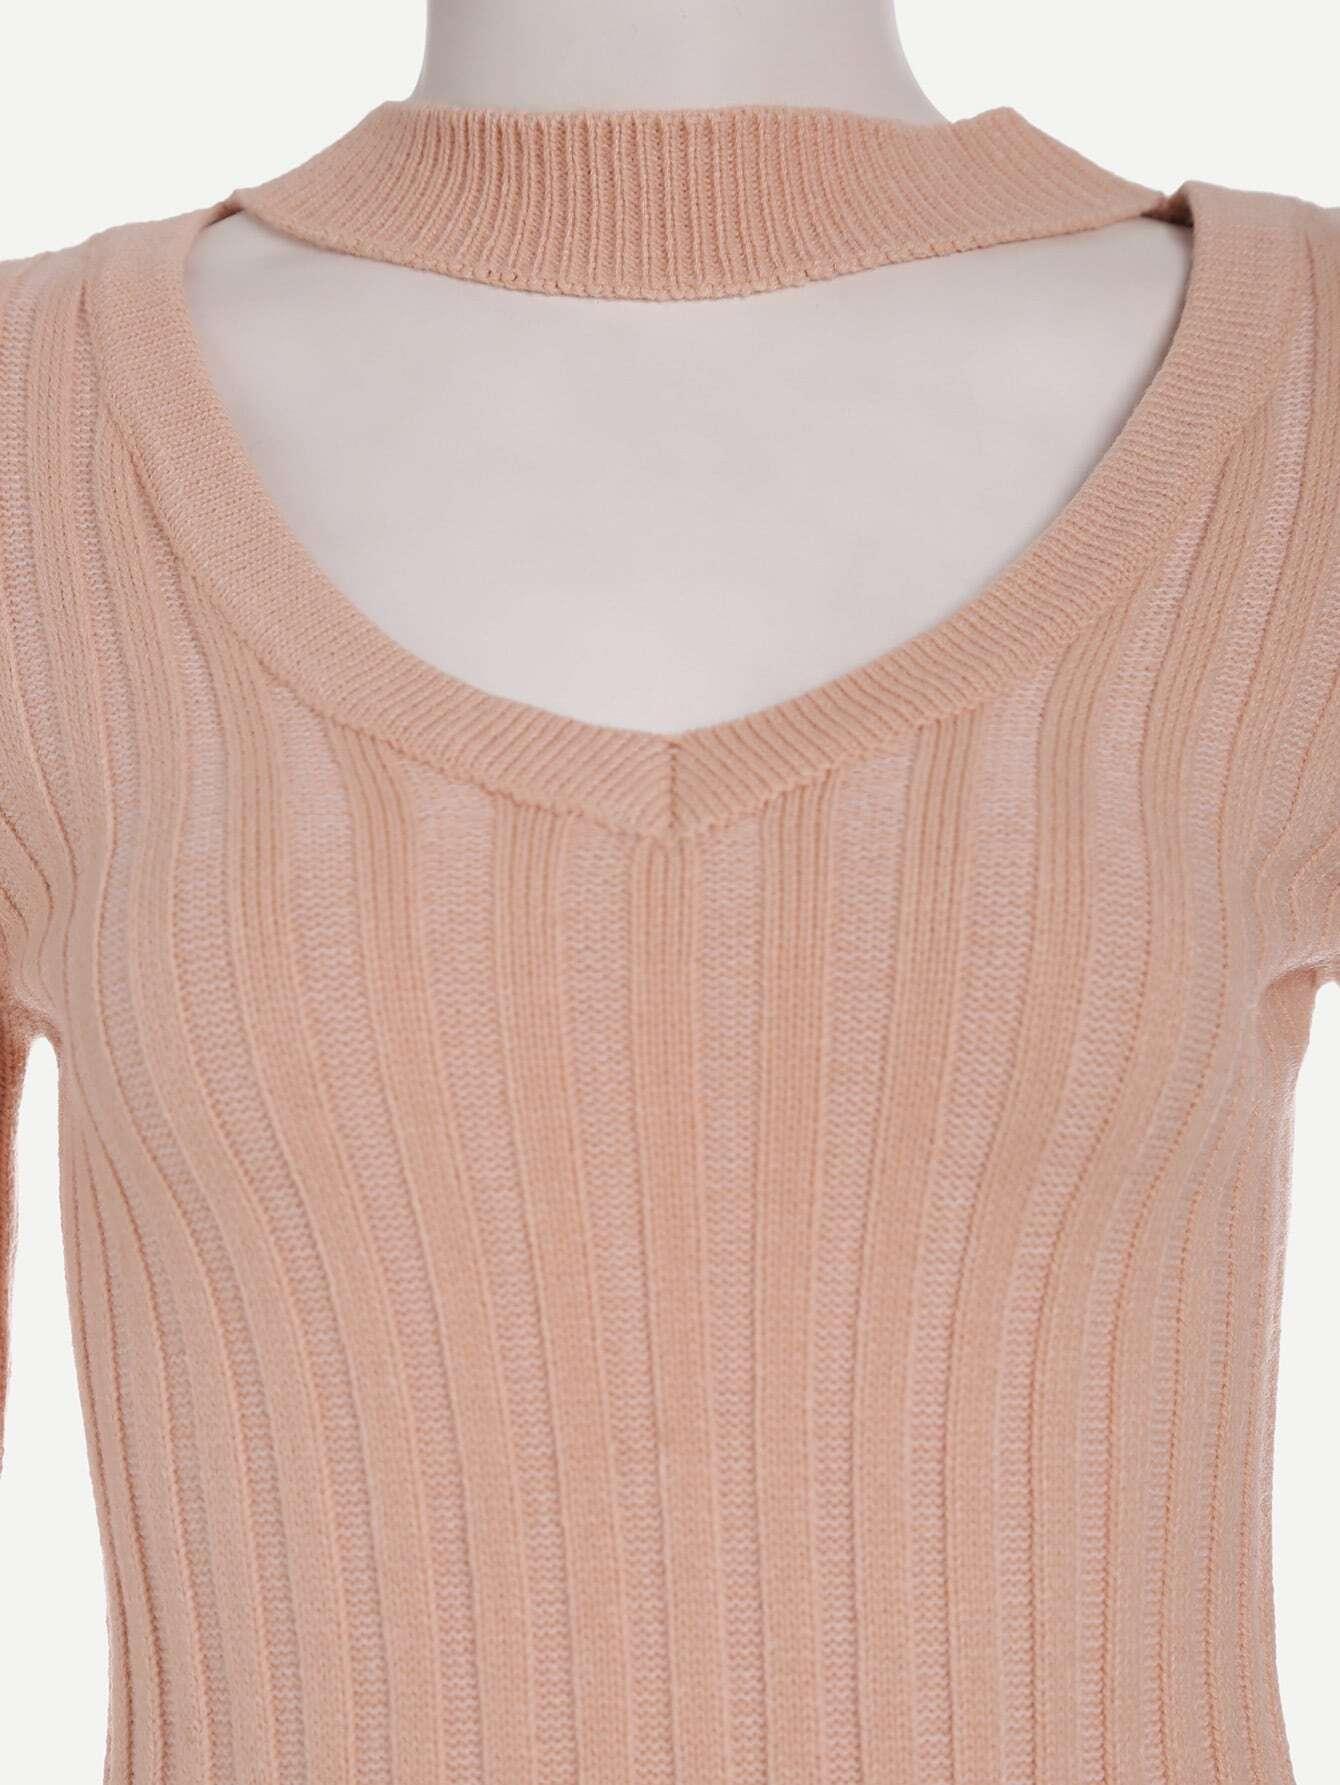 sweater161011403_2